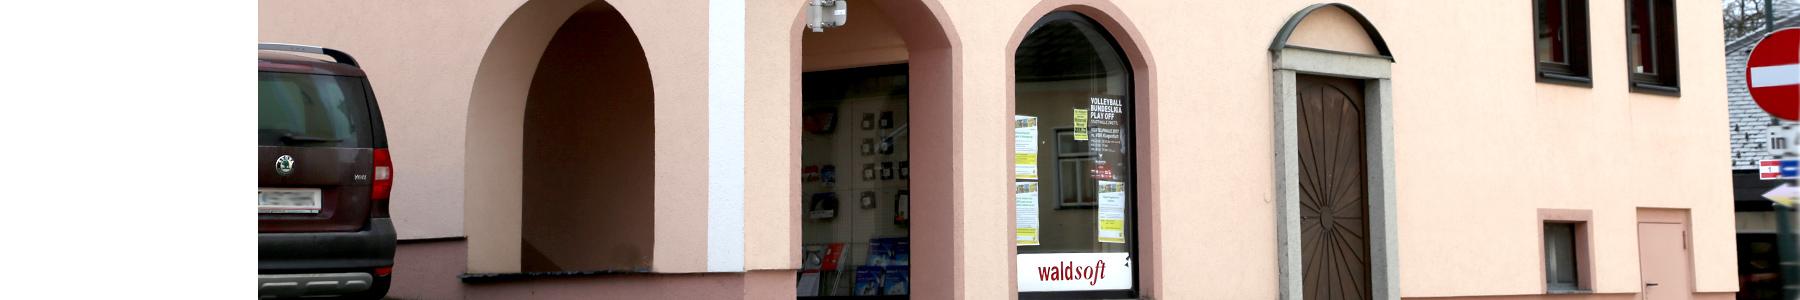 waldsoft Büro in Arbesbach